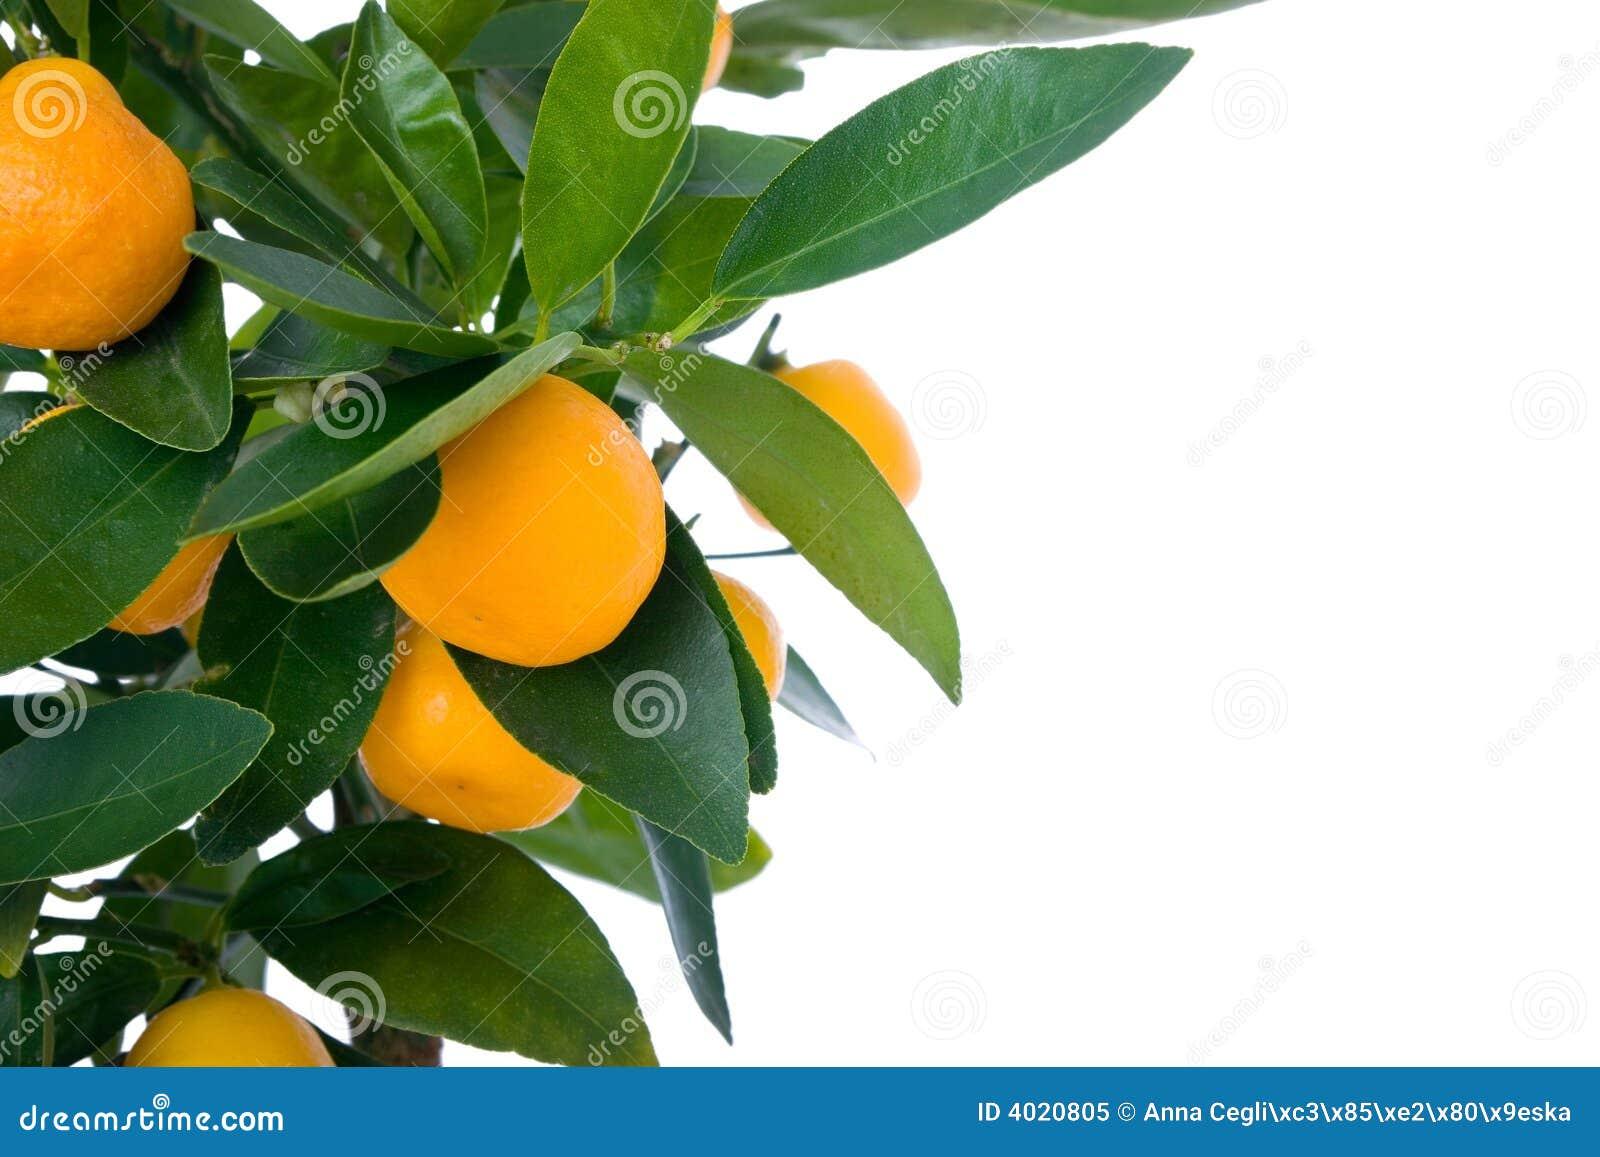 Citrus Tree With Fruit - Small Orange Royalty Free Stock ...